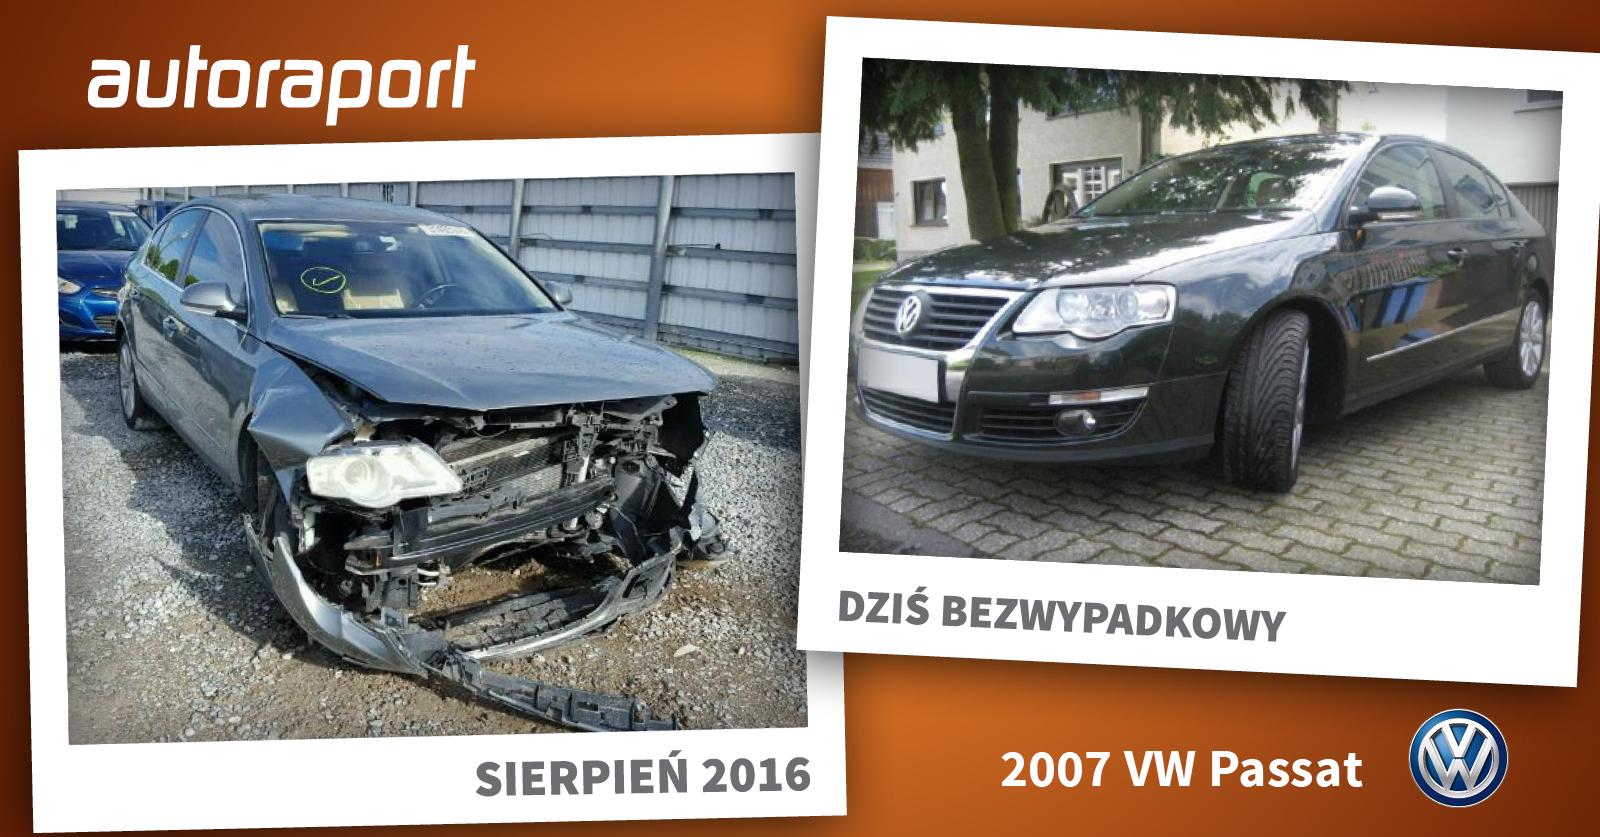 1200x628_2007_VW Passat